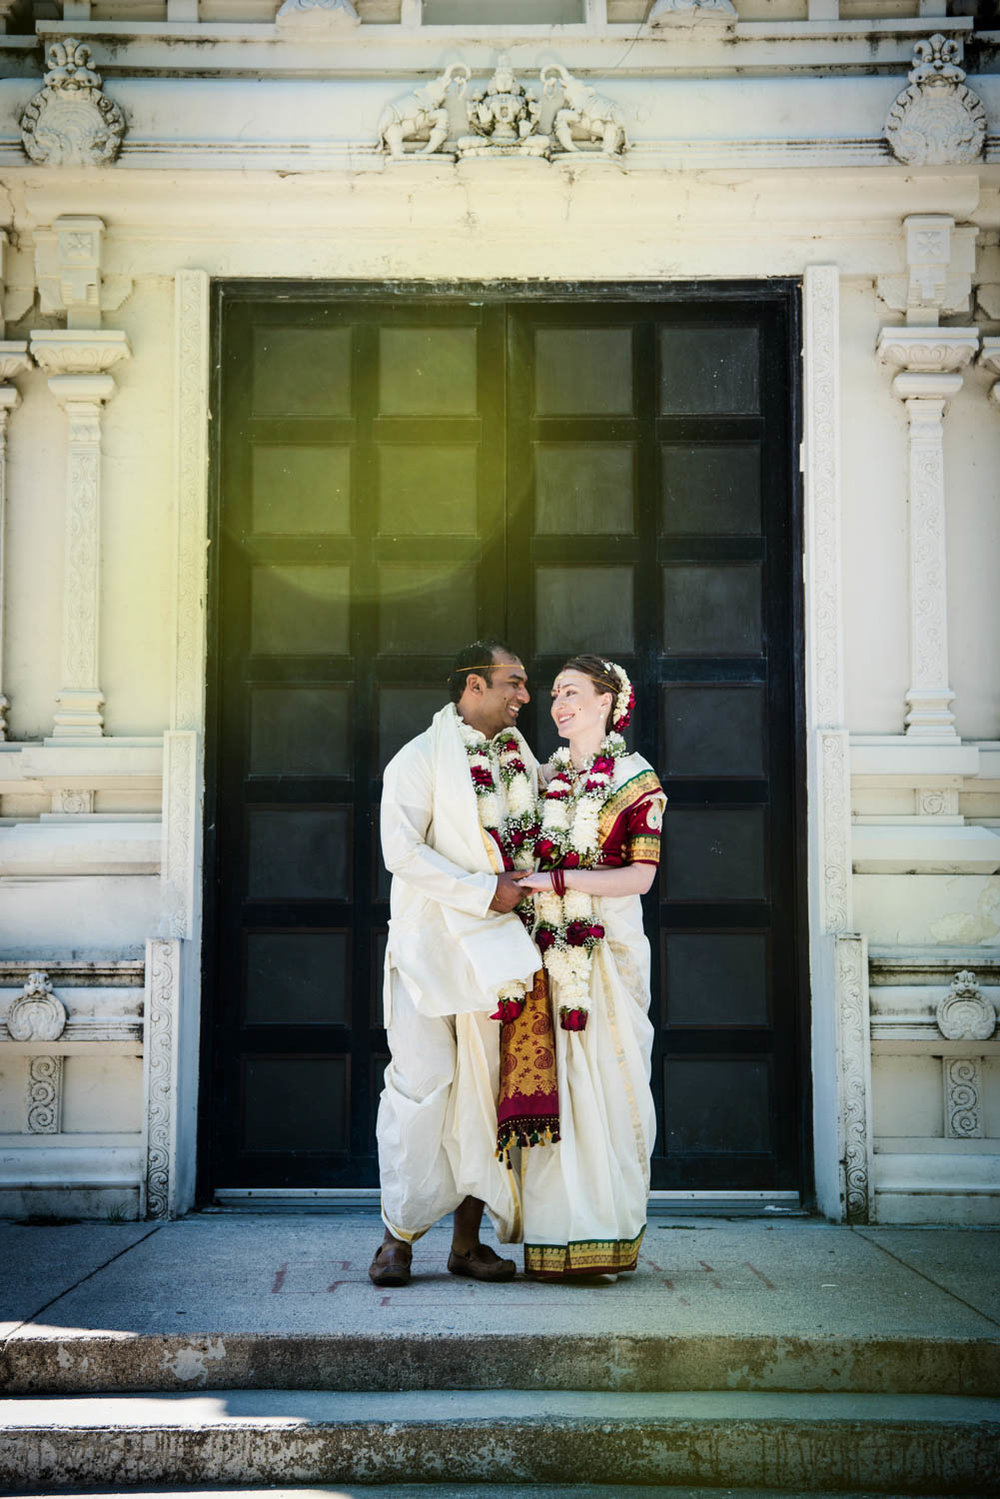 ecaterina-chandu-indian-wedding33.jpg